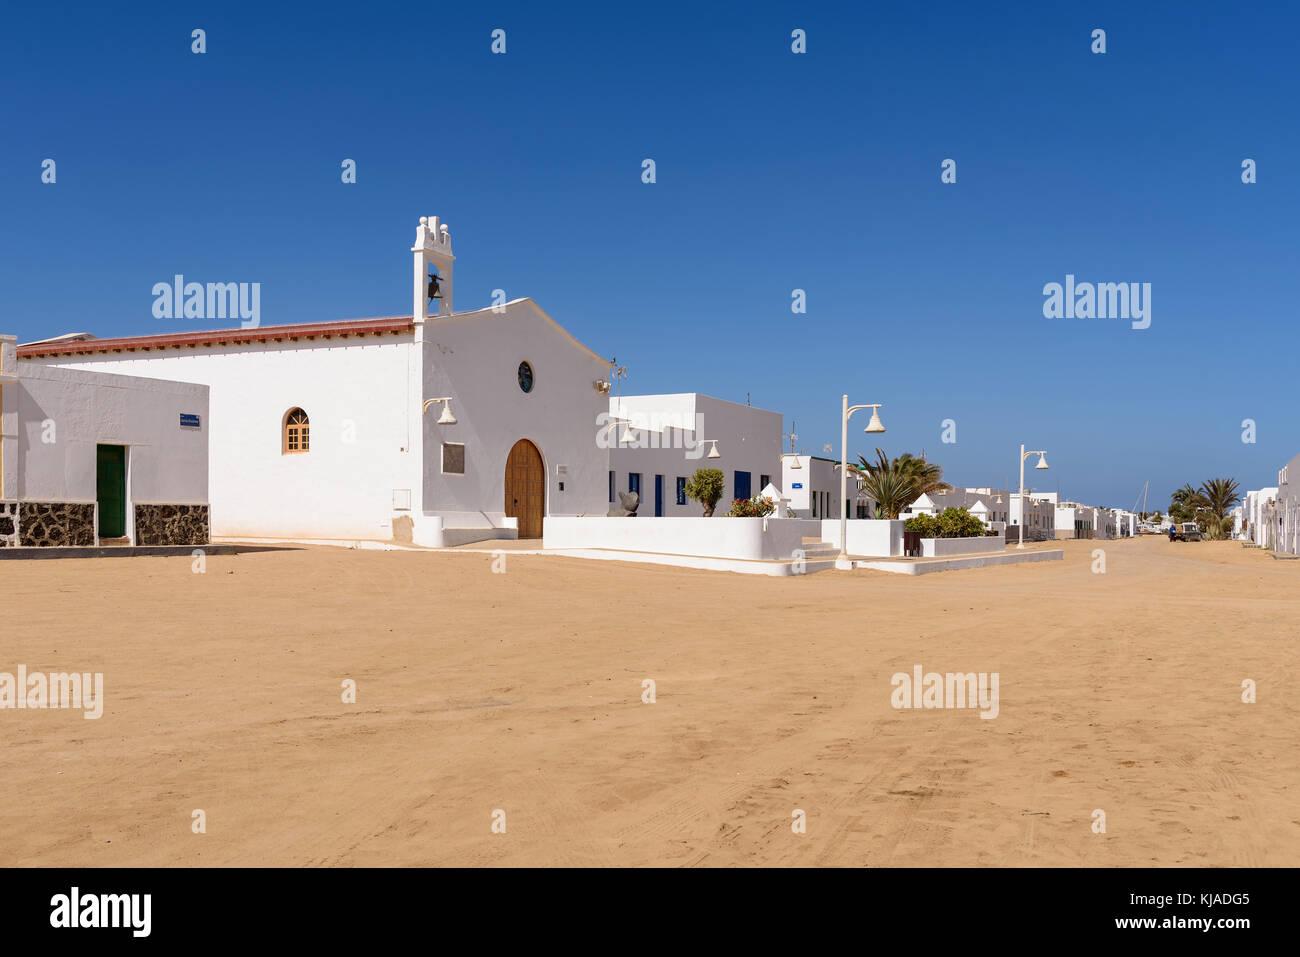 Kirche von Caleta del Sebo auf der Isla Graciosa, Kanarische Inseln, Spanien Stockbild